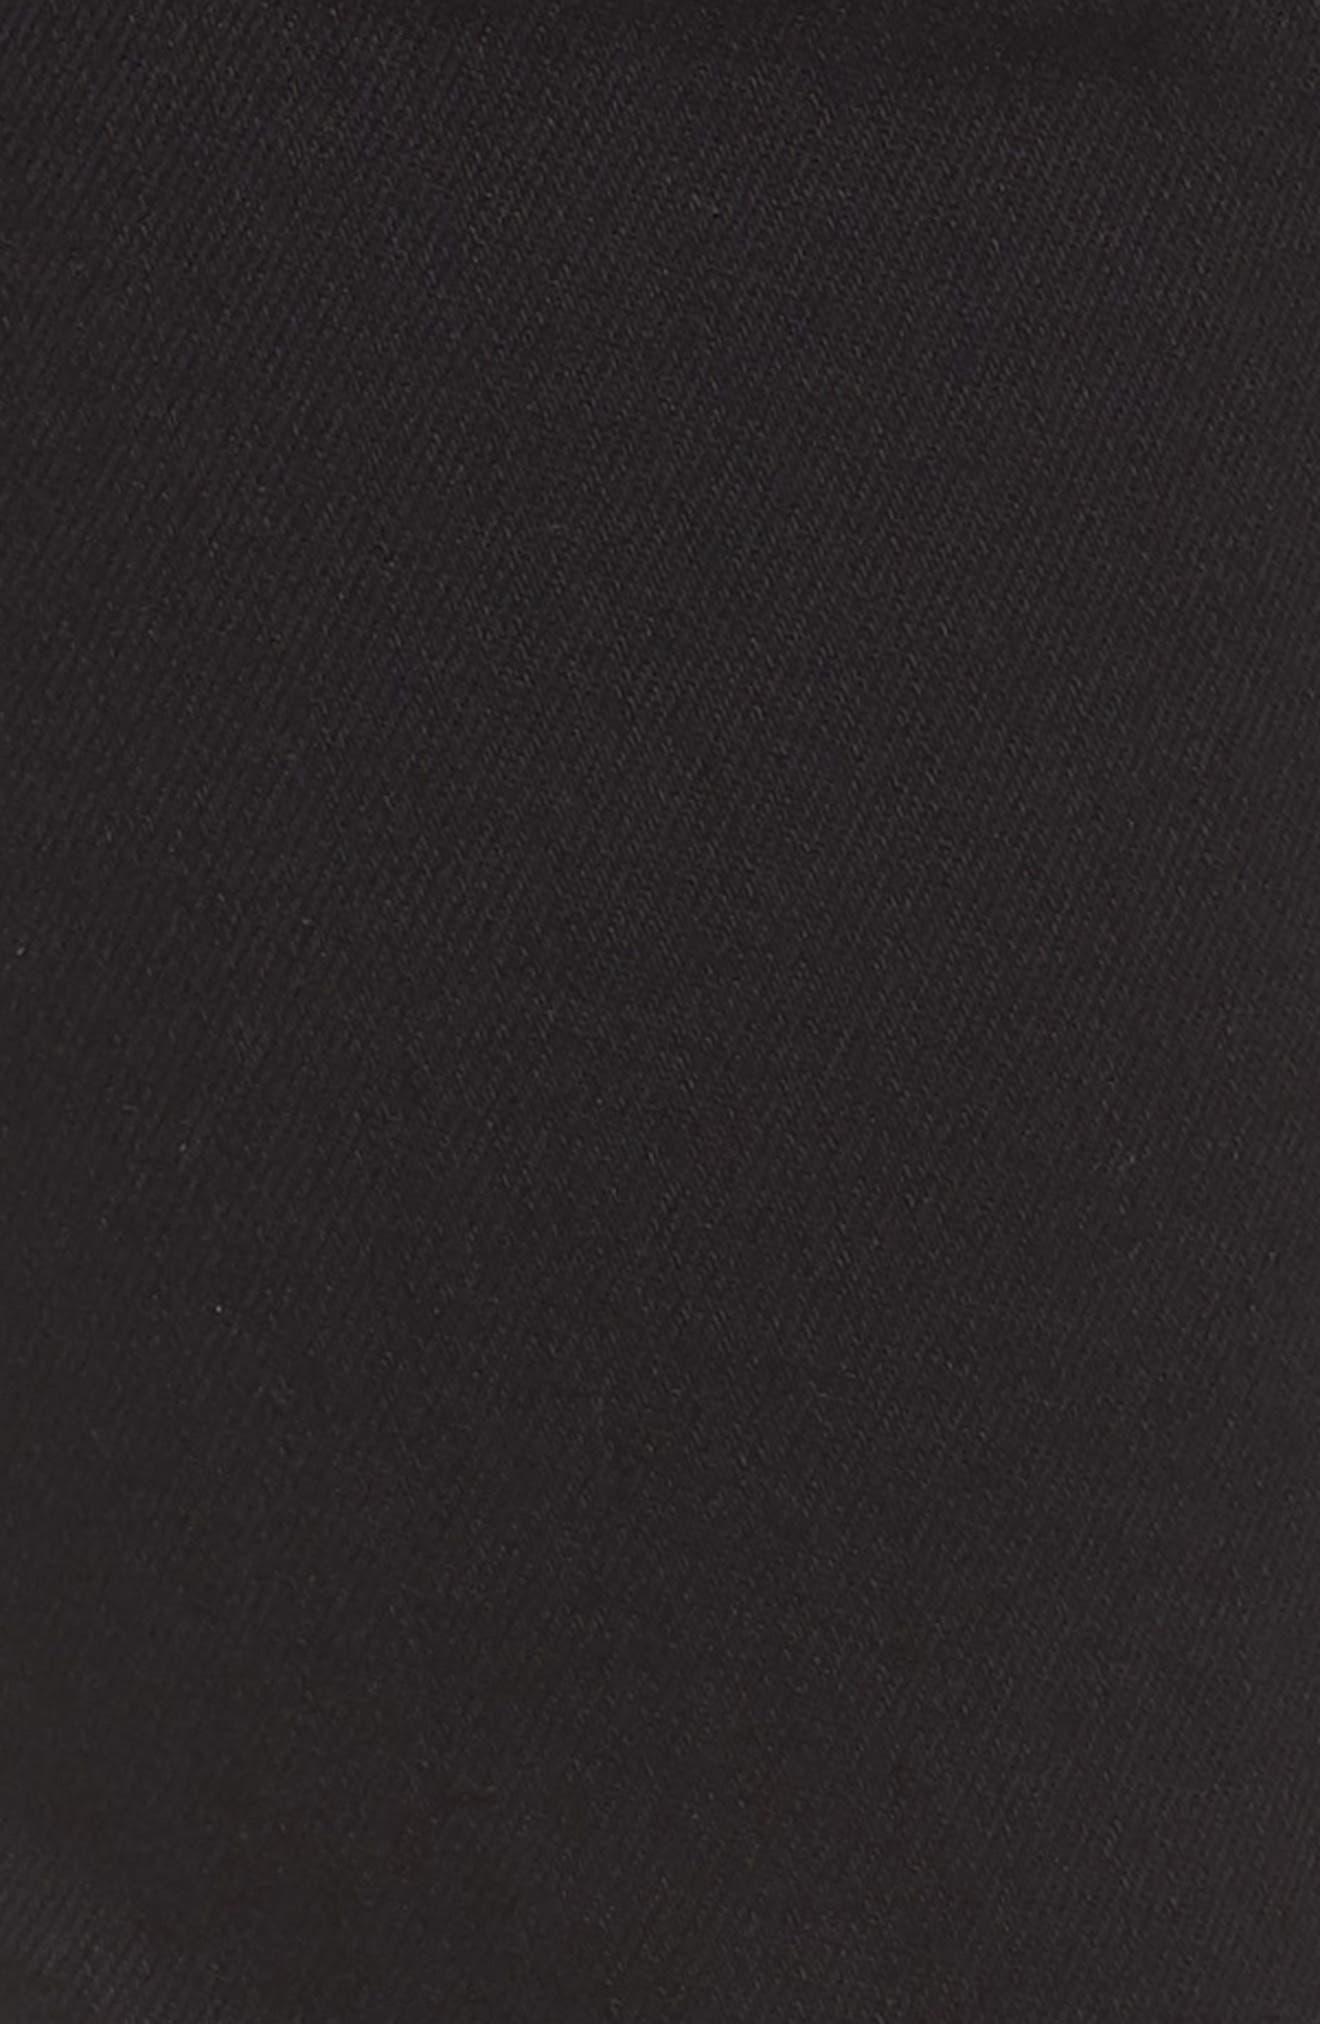 Karly Black Nolita Roll Cuff Bermuda Shorts,                             Alternate thumbnail 5, color,                             001